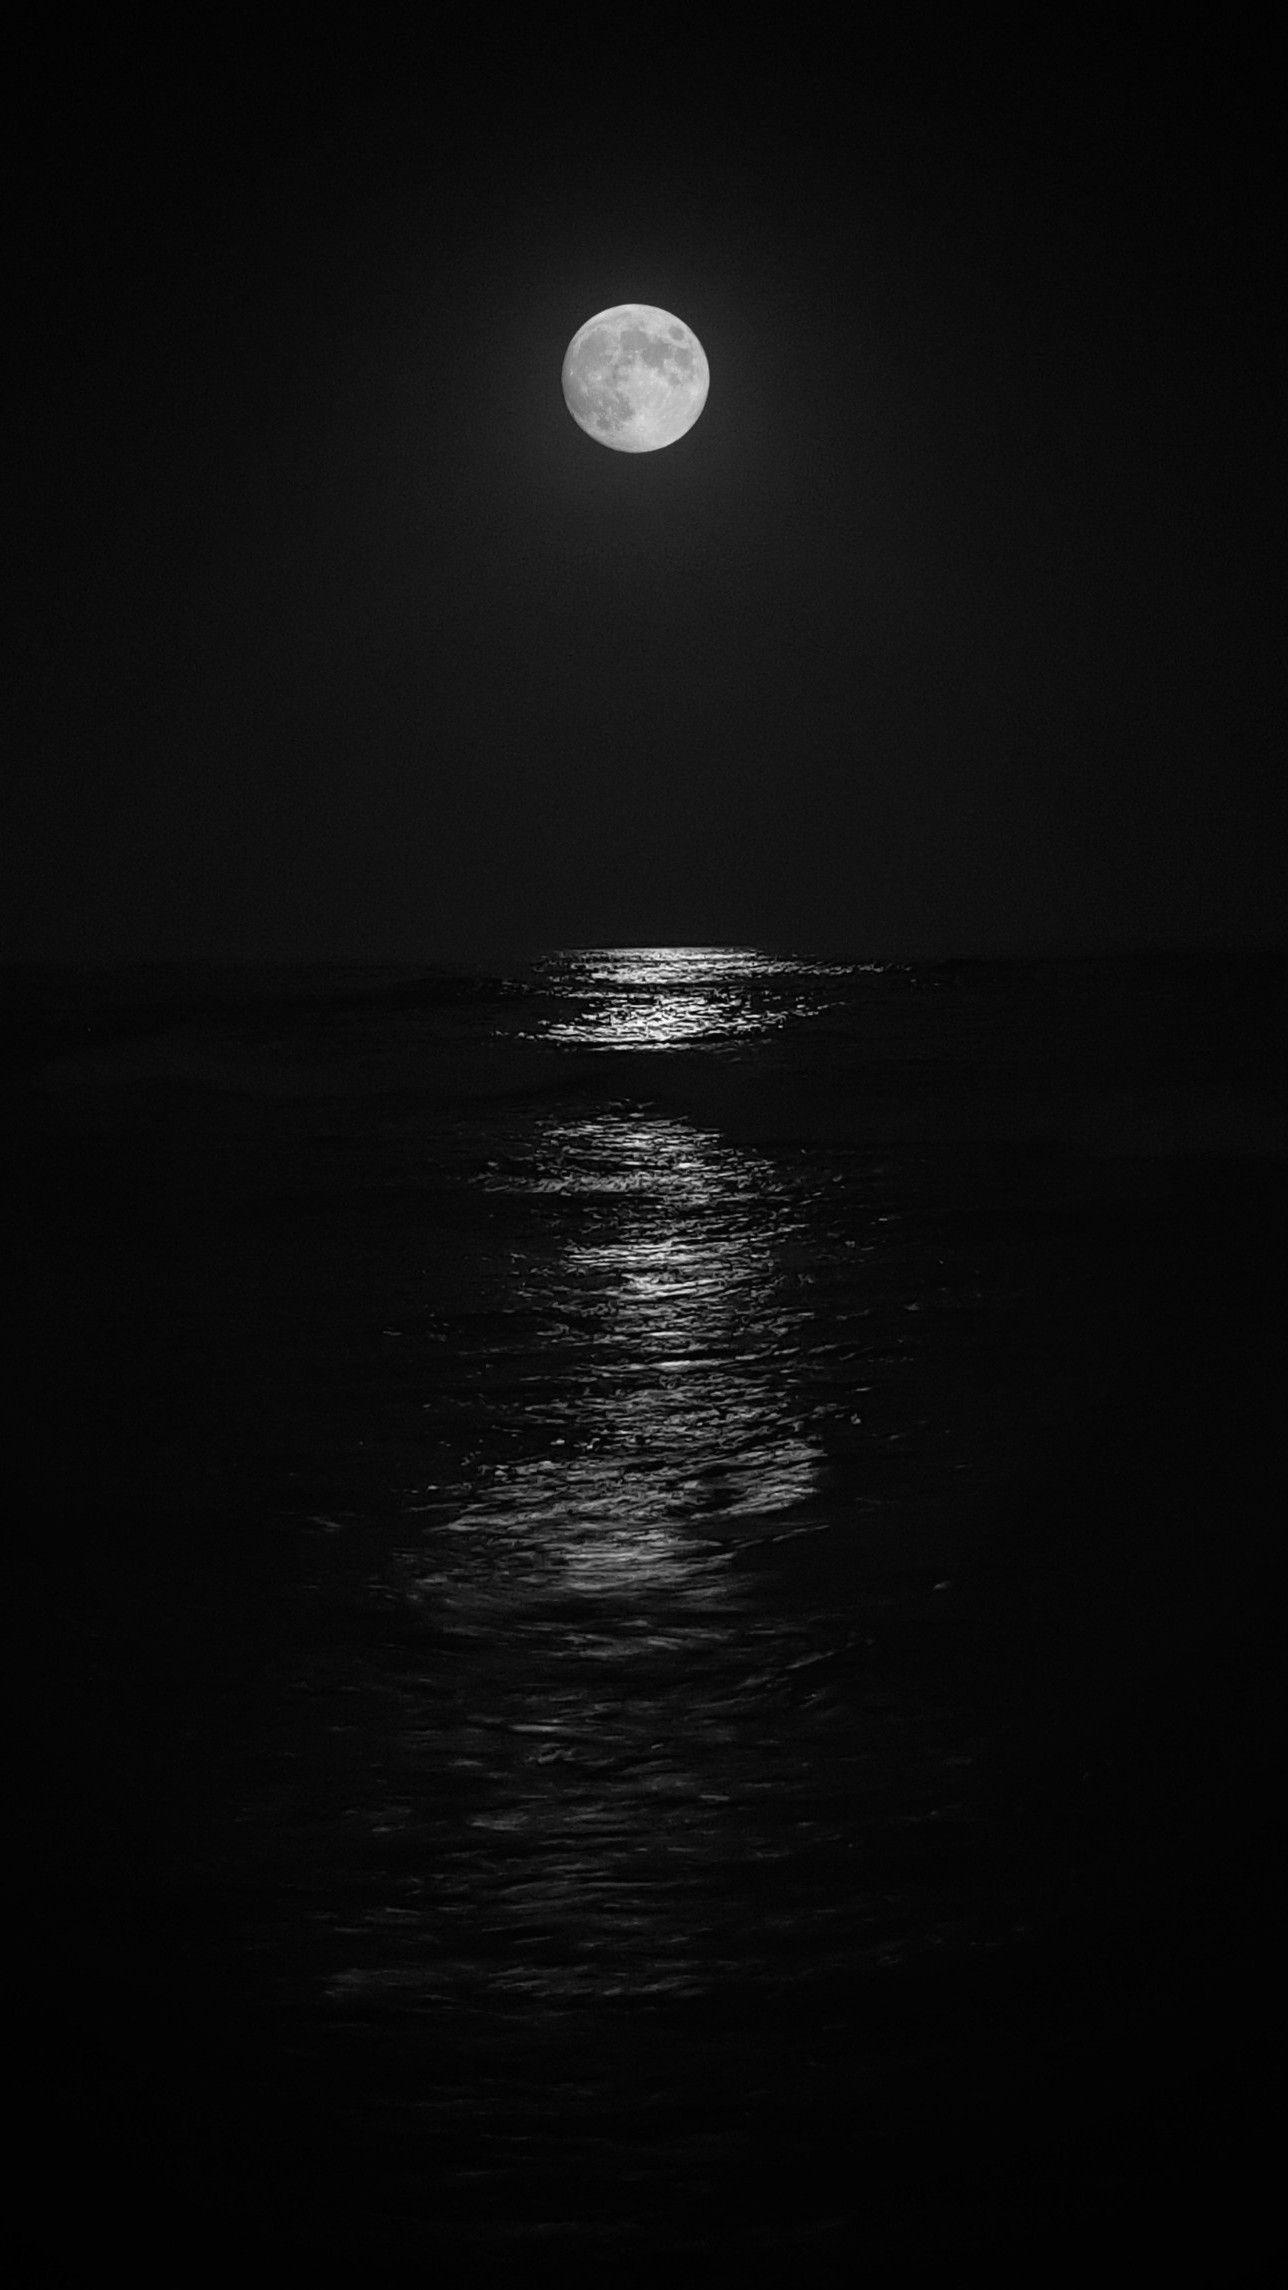 Moonlight Reflection On The Seawater إنعكاس ضوء القمر على مياه البحر Instagram Photo And Video Instagram Photo